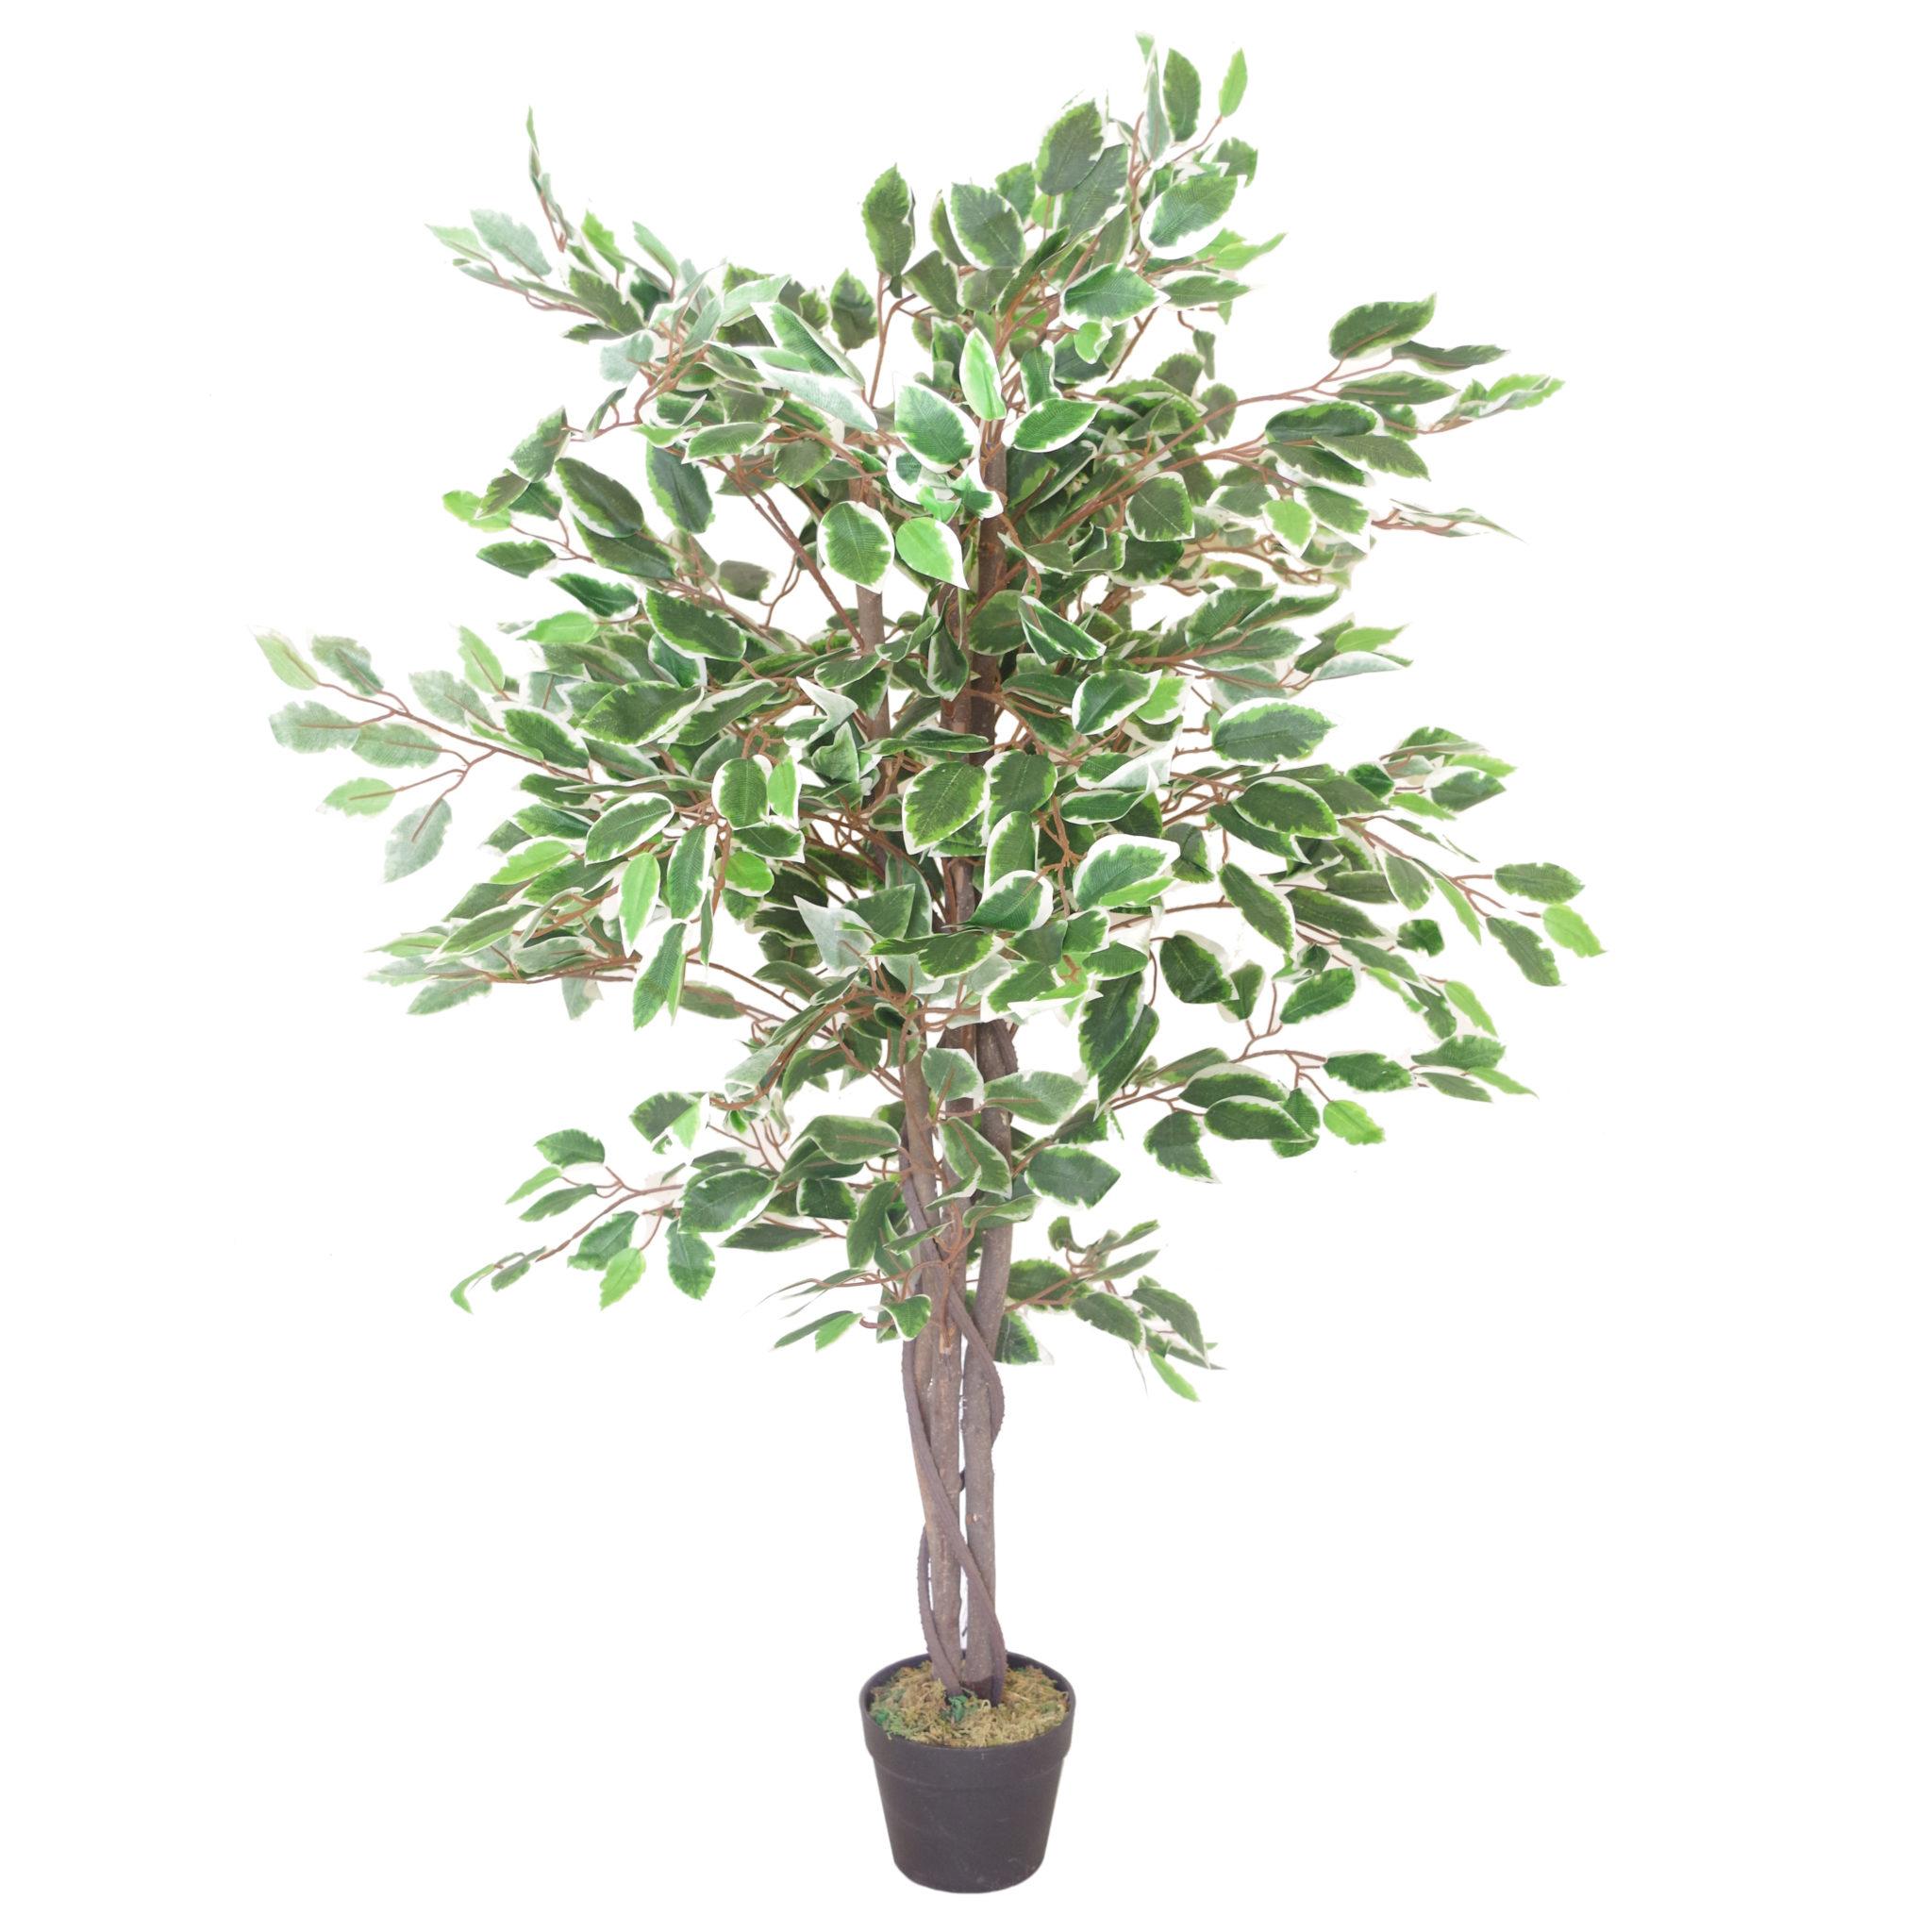 105cm large ultra realistic white edge ficus artificial plant tree. Black Bedroom Furniture Sets. Home Design Ideas